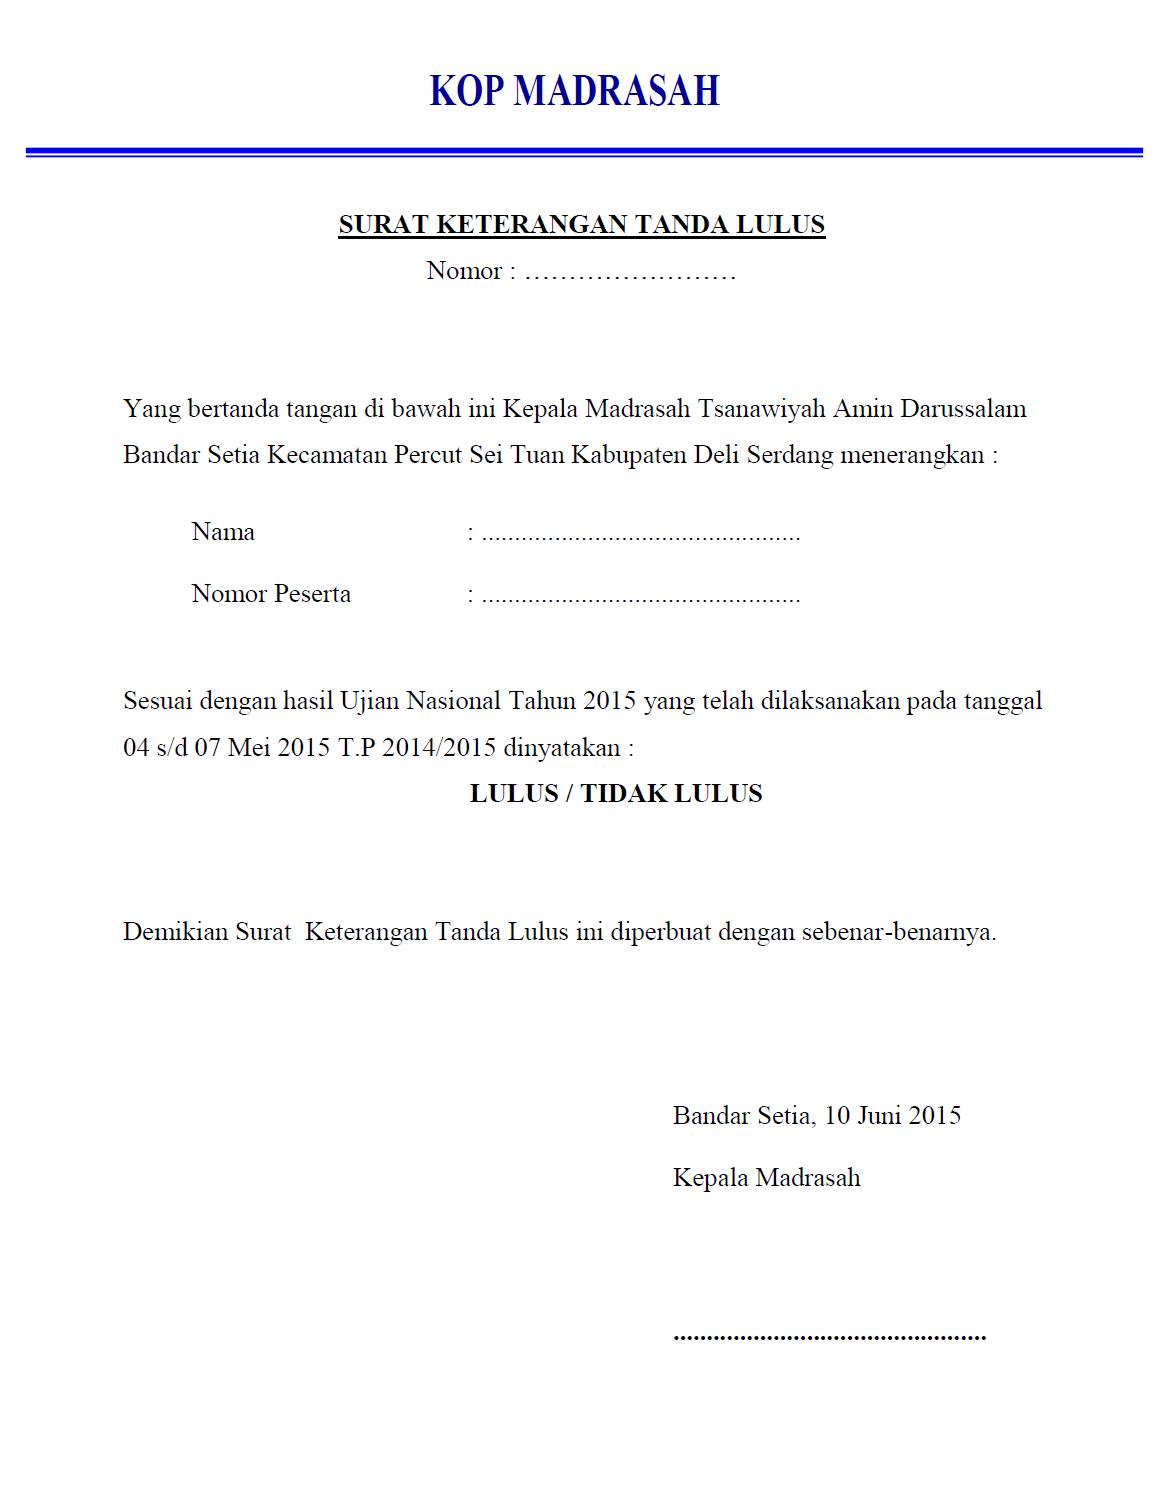 Mts Amin Darussalam Contoh Surat Pengumuman Kelulusan Cara Cepat